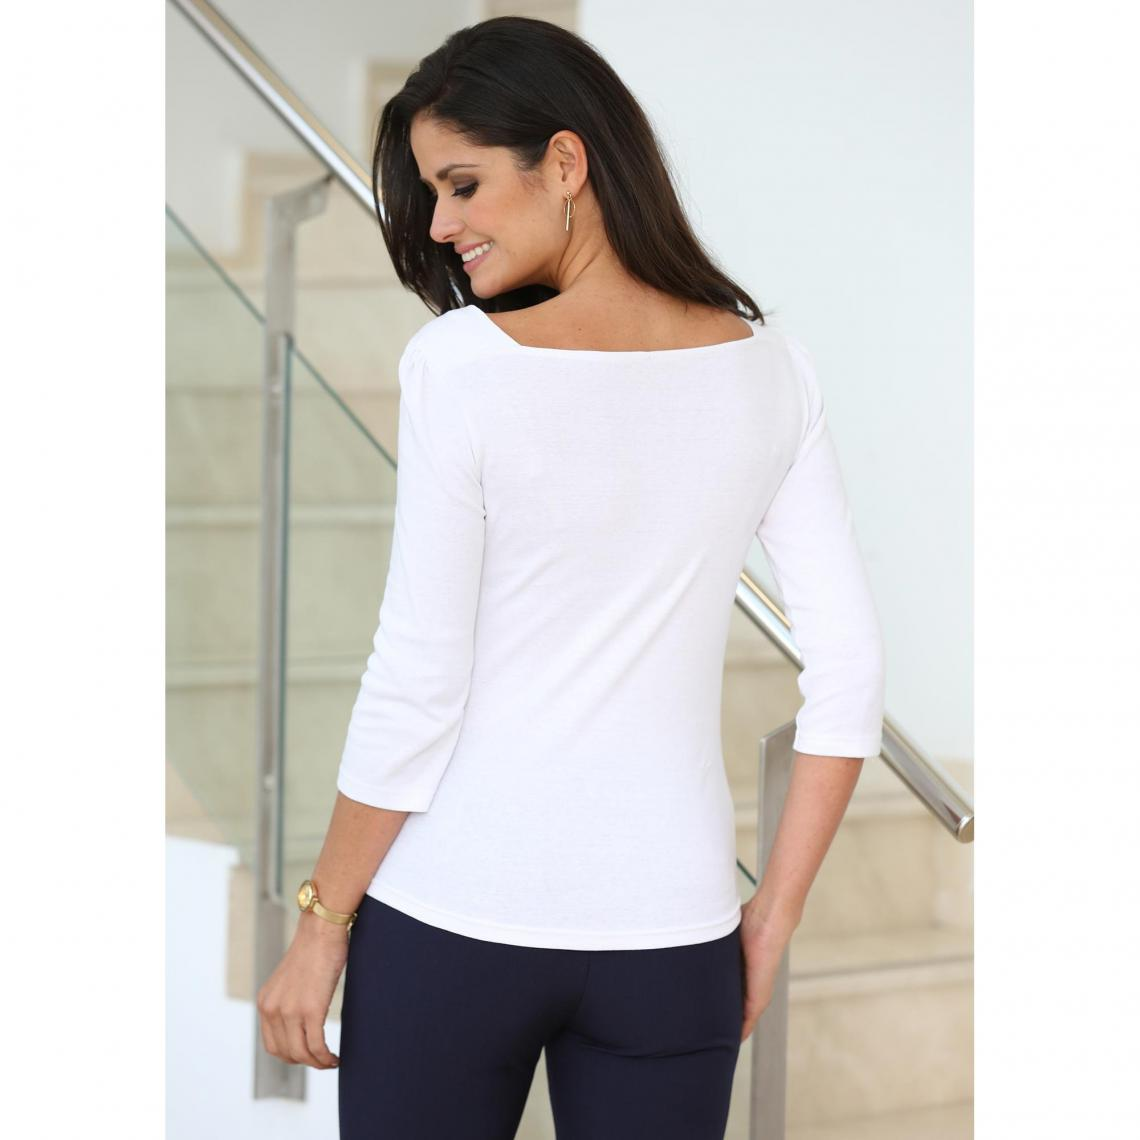 Tee-shirt col carré manches 3\/4 boutons femme - Blanc DuShX